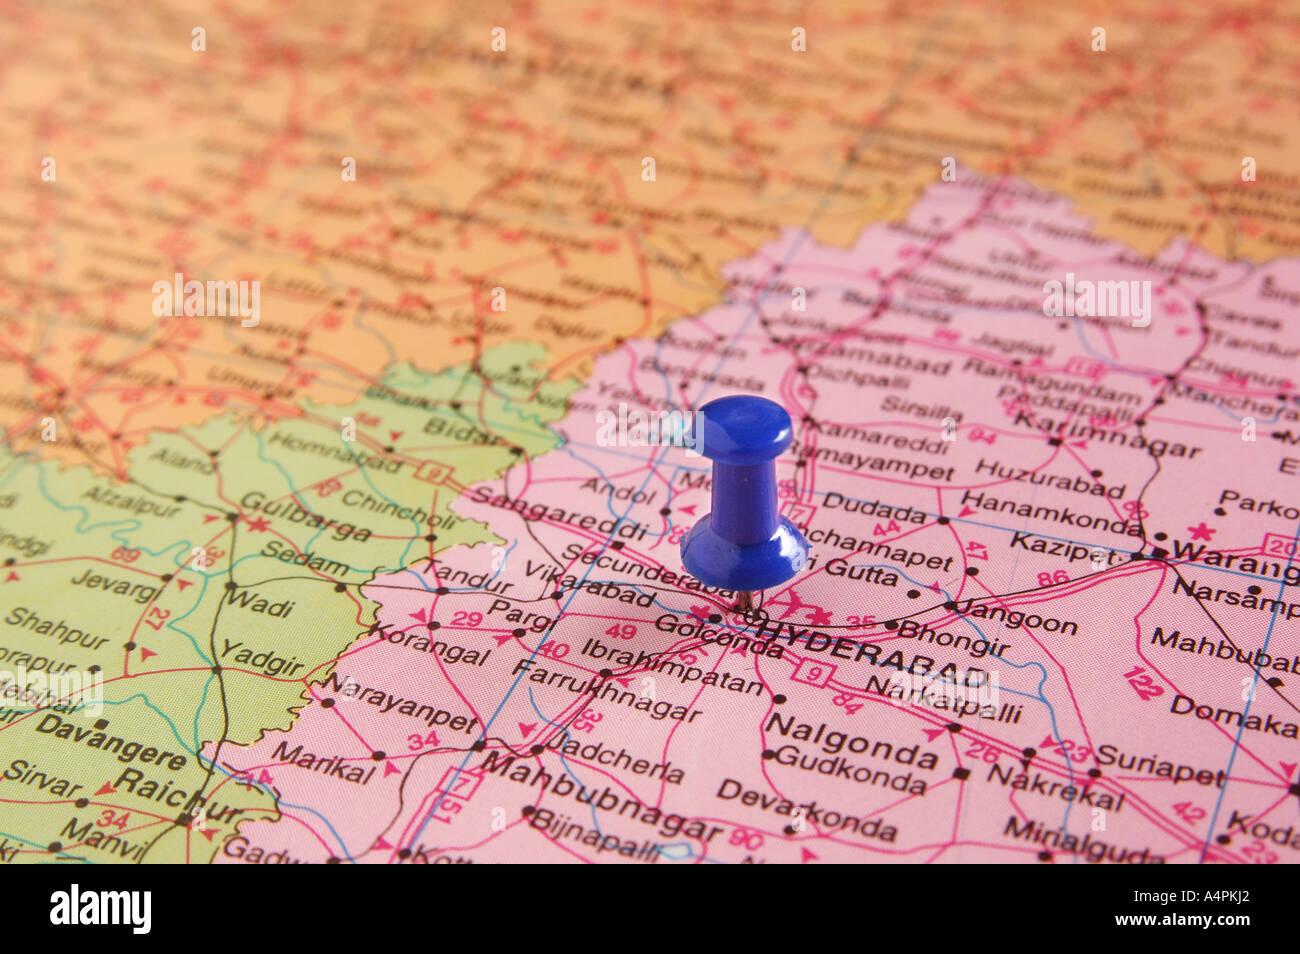 ANG77814 Carte de l'Inde repéré Hydrabad capitale de l'Andhra Pradesh par broche Conseil couleur bleu Photo Stock